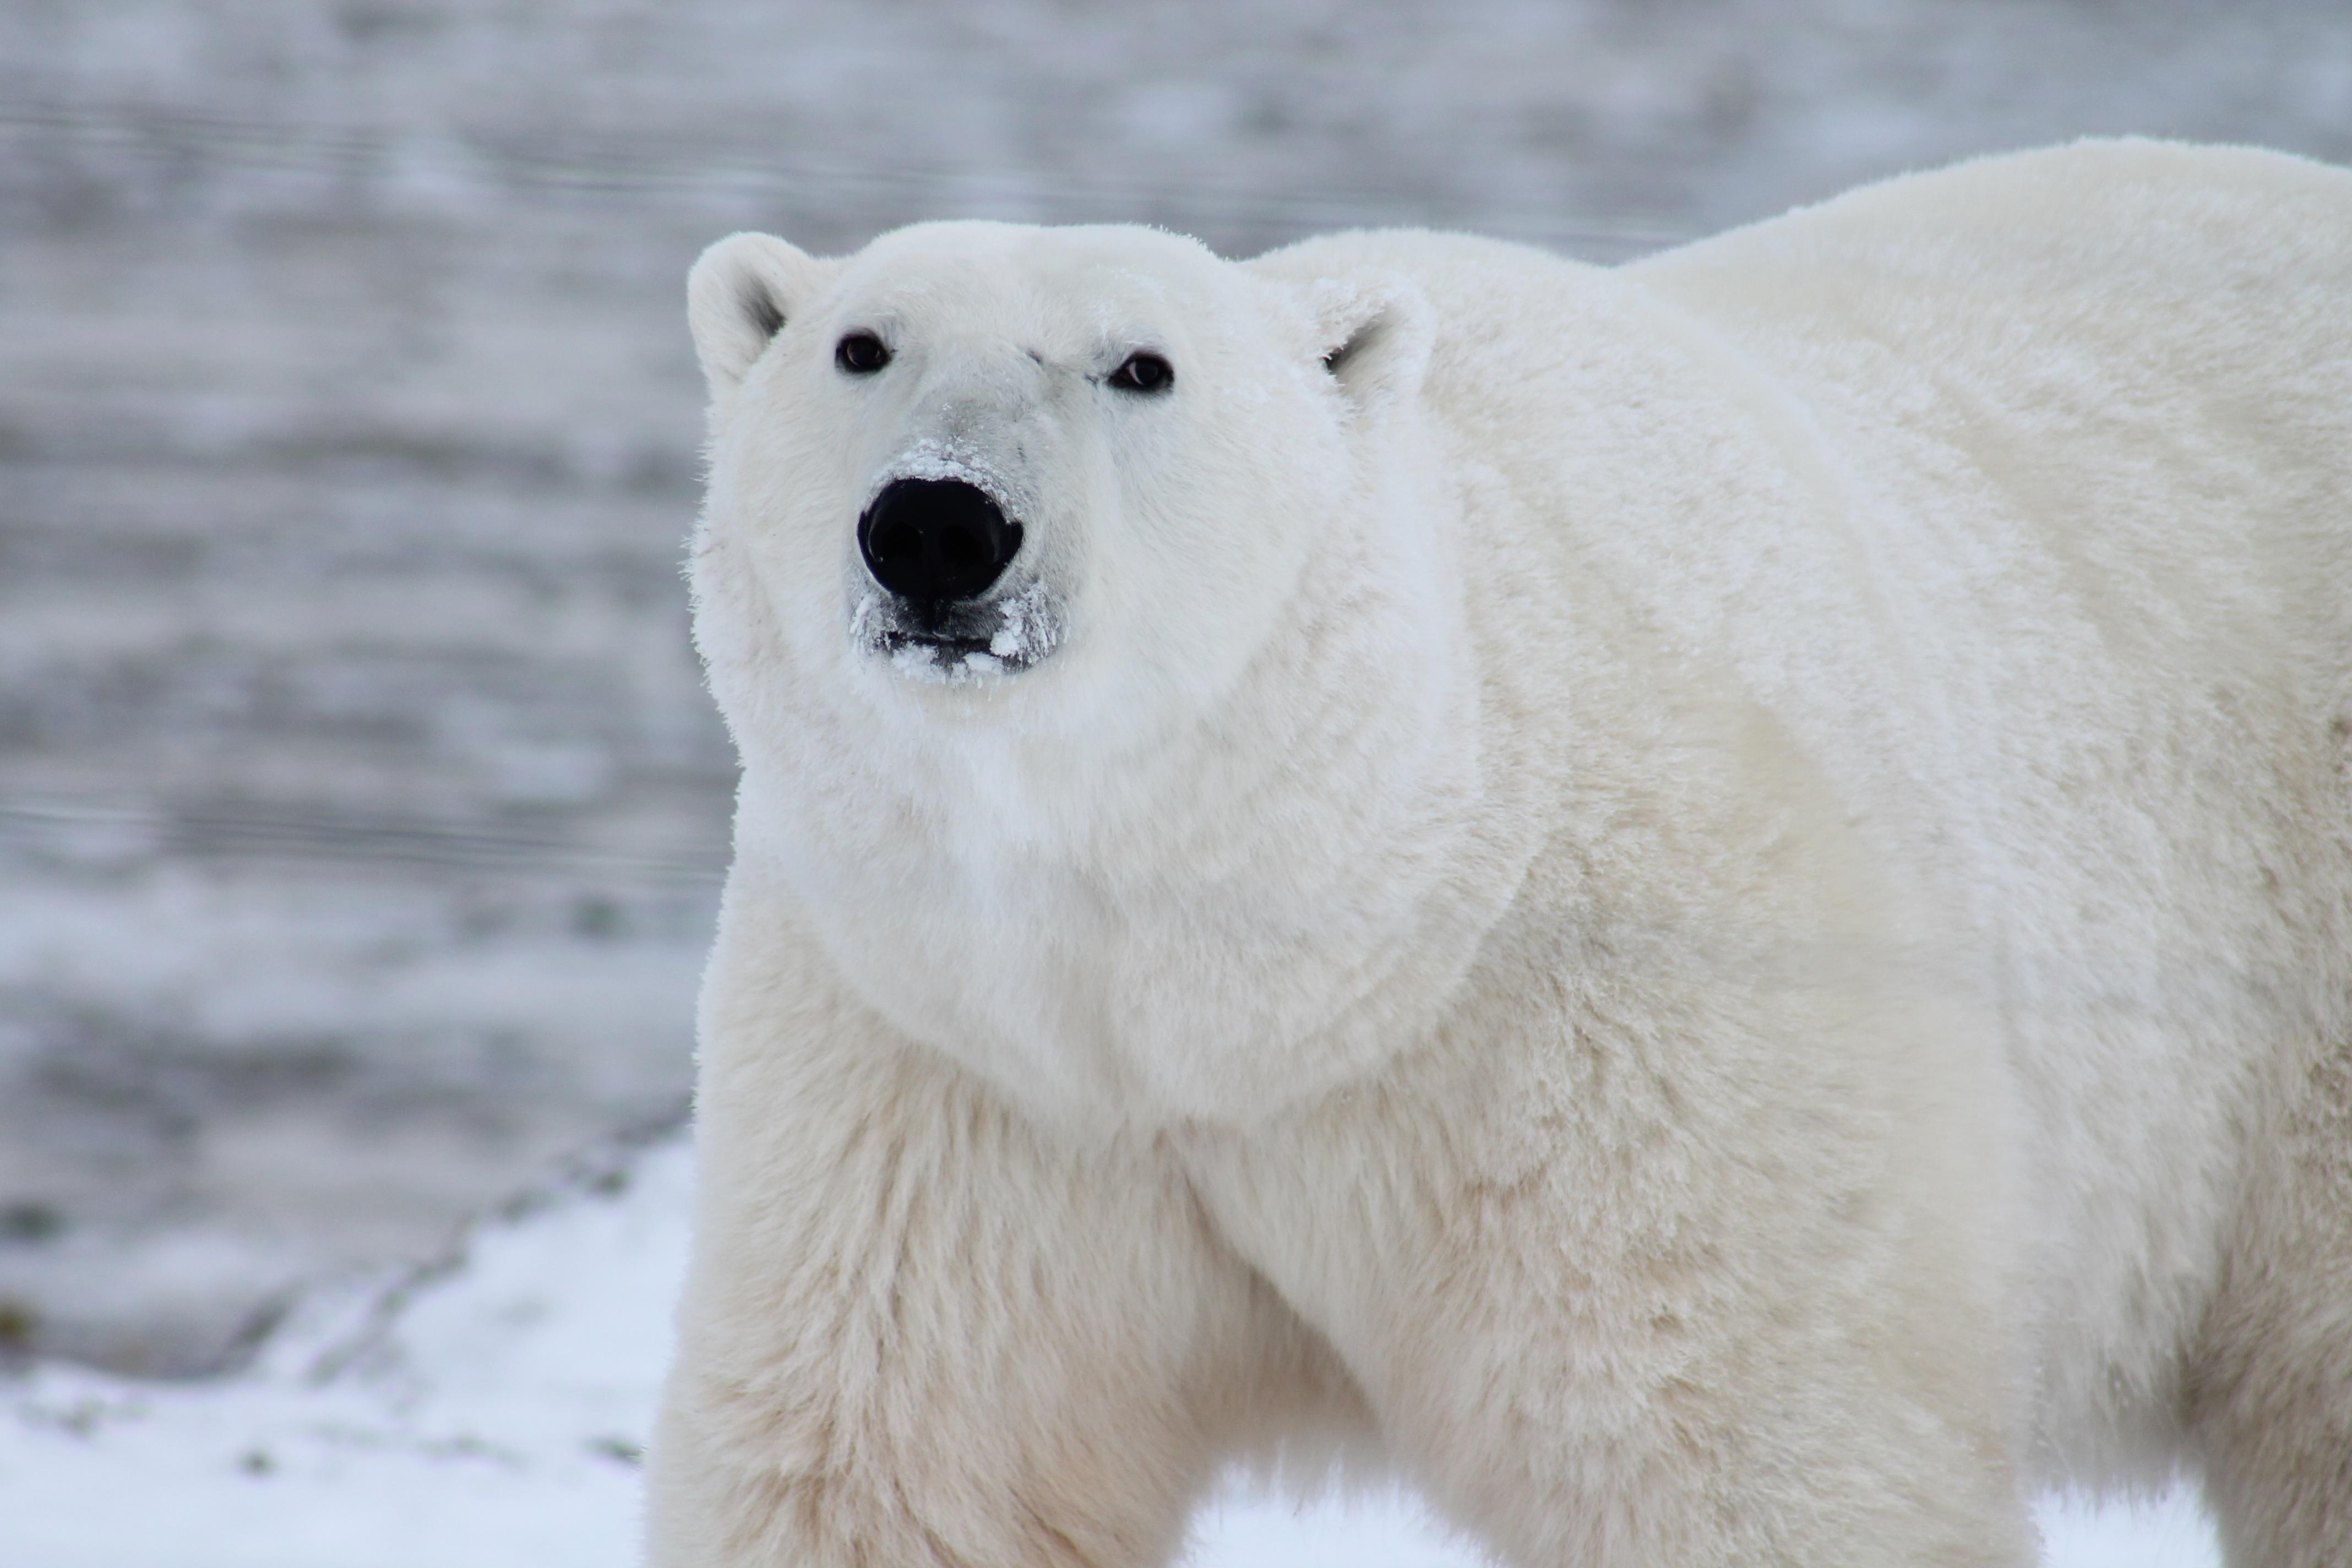 A polar bear roams the Arctic tundra. November 2013. [Pixaby]